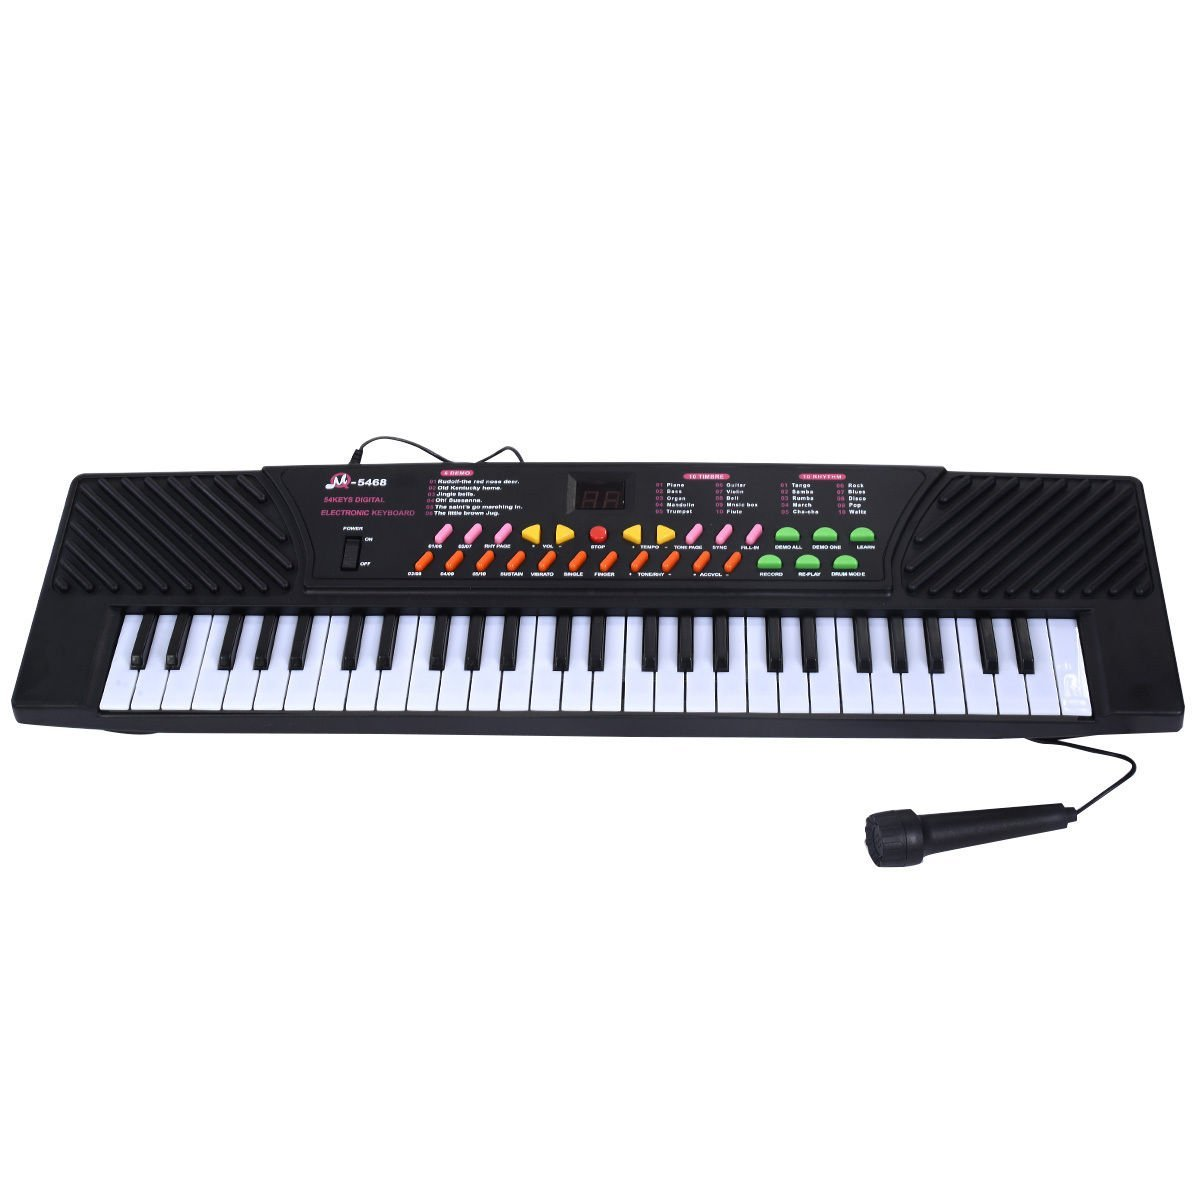 Mascarello® 54 Keys Music Electronic Keyboard Kid Electric Piano Organ W/Mic & Adapter by Mascarello (Image #1)